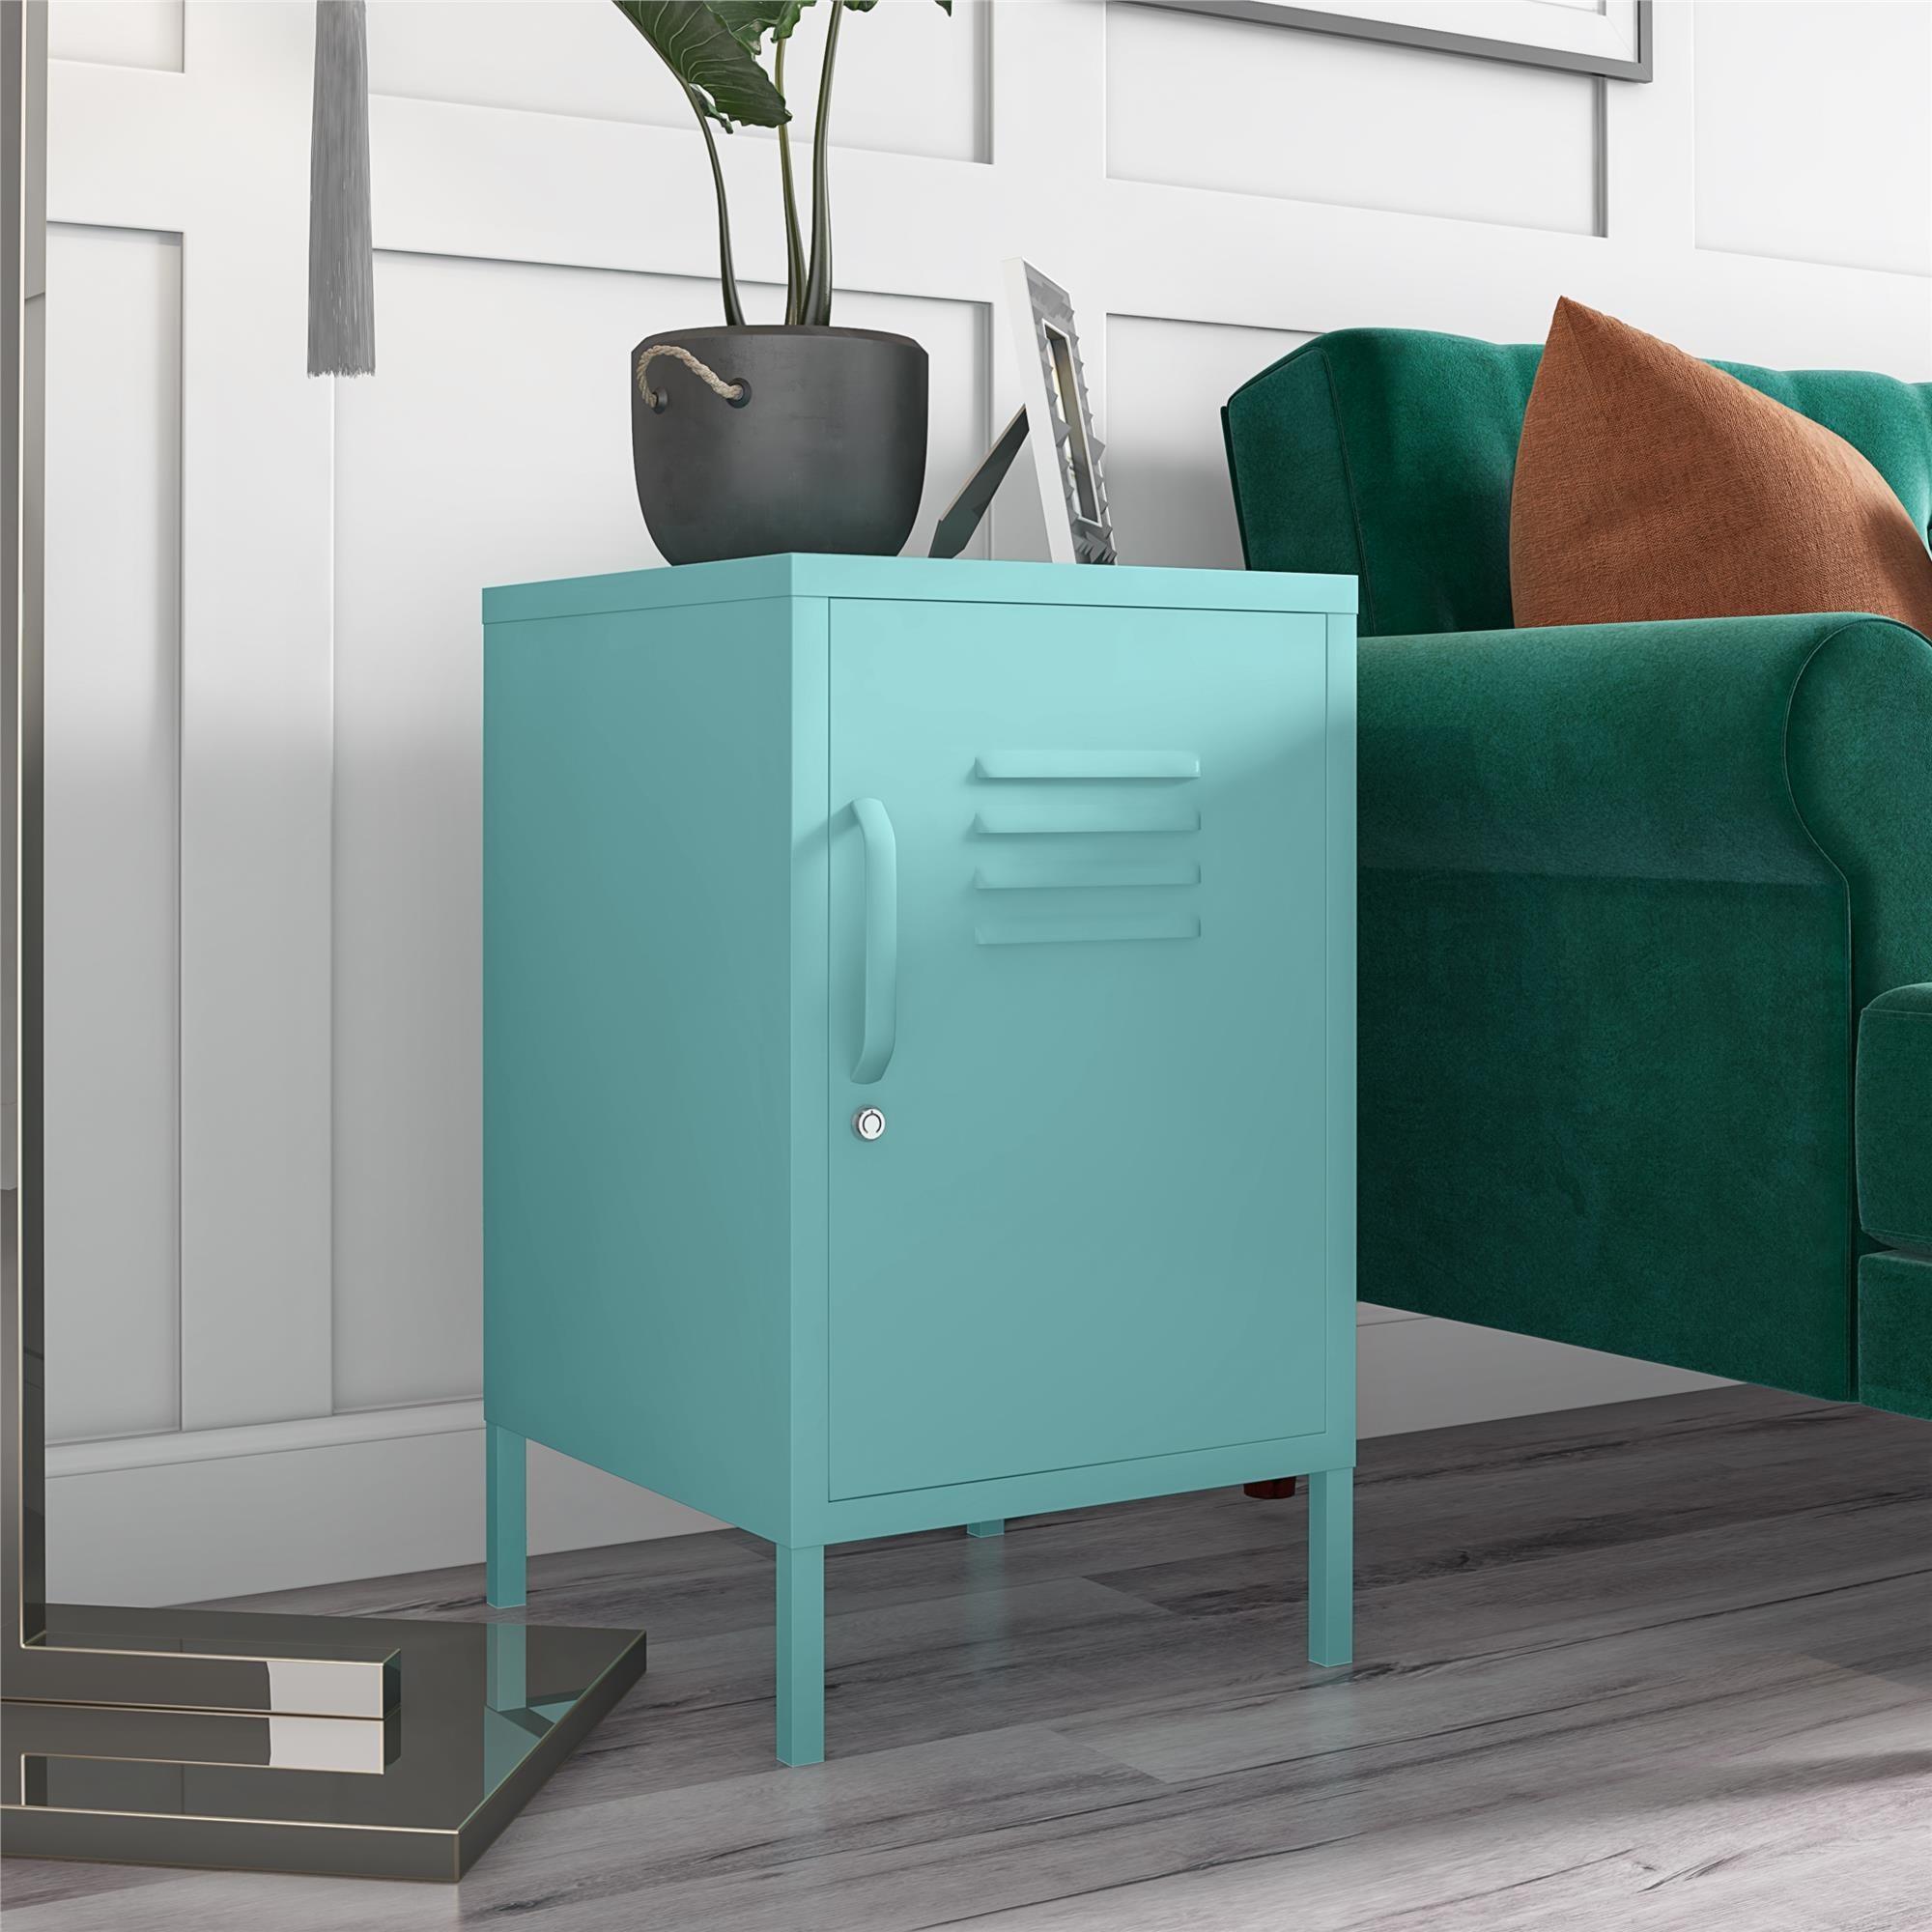 metal end table shaped like locker